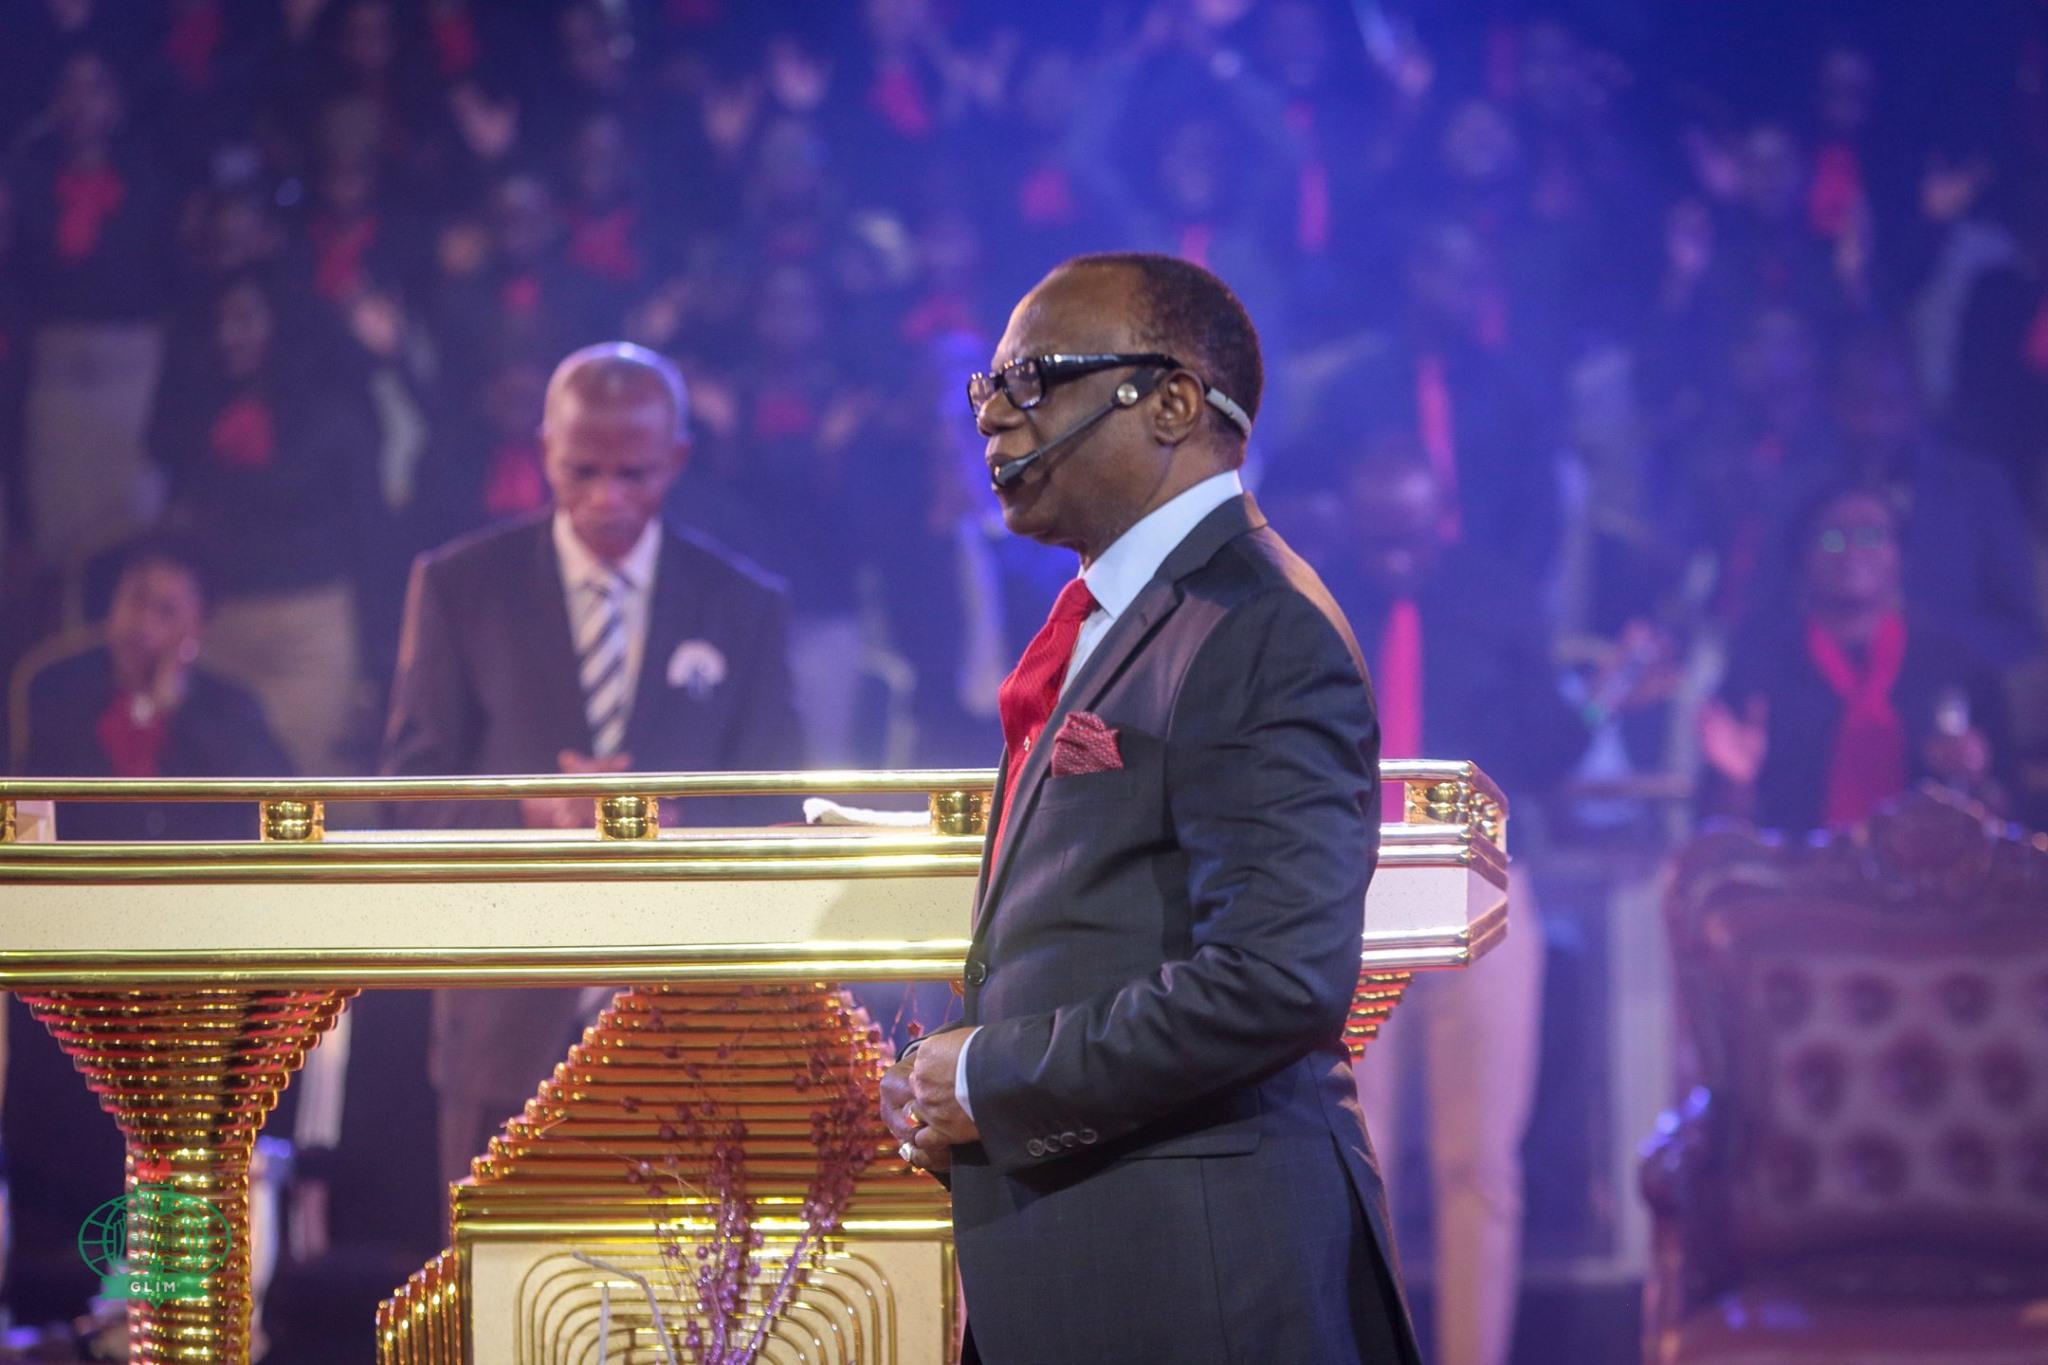 Rev. Felix Omobude speaking on fruitful season